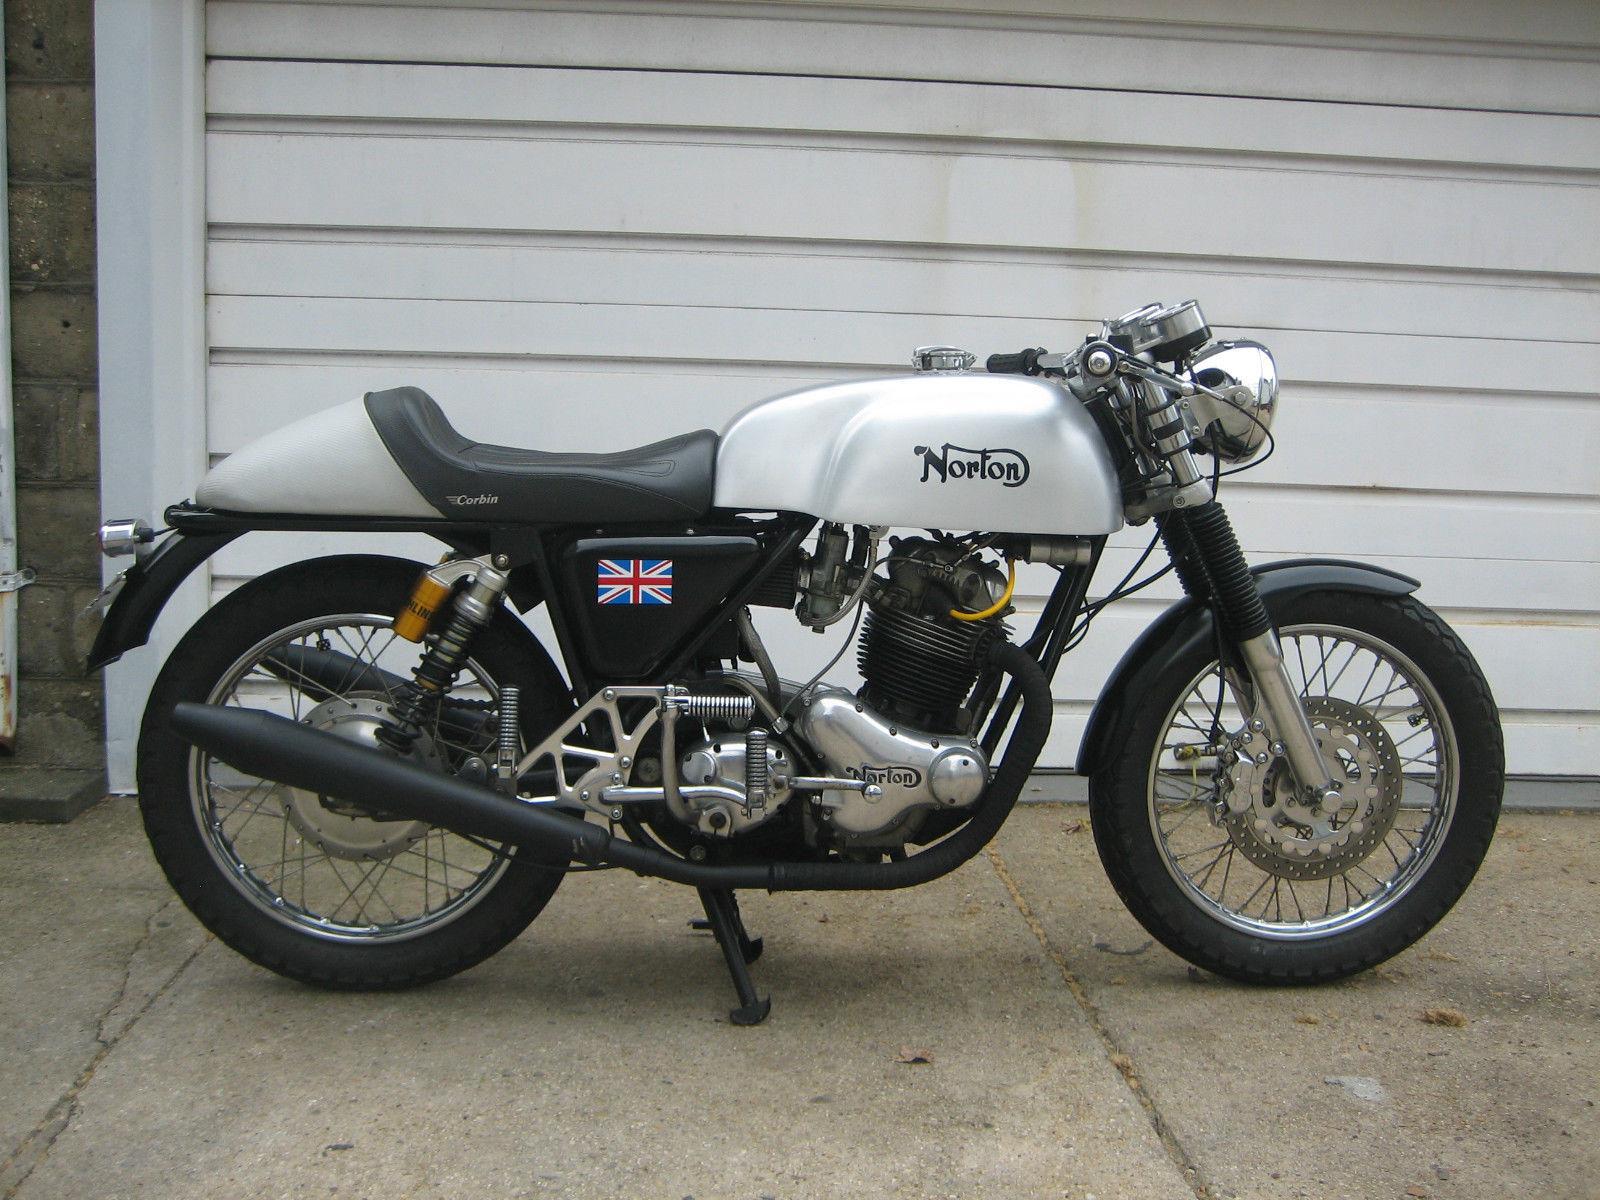 1972 Norton Commando Cafe racer for sale